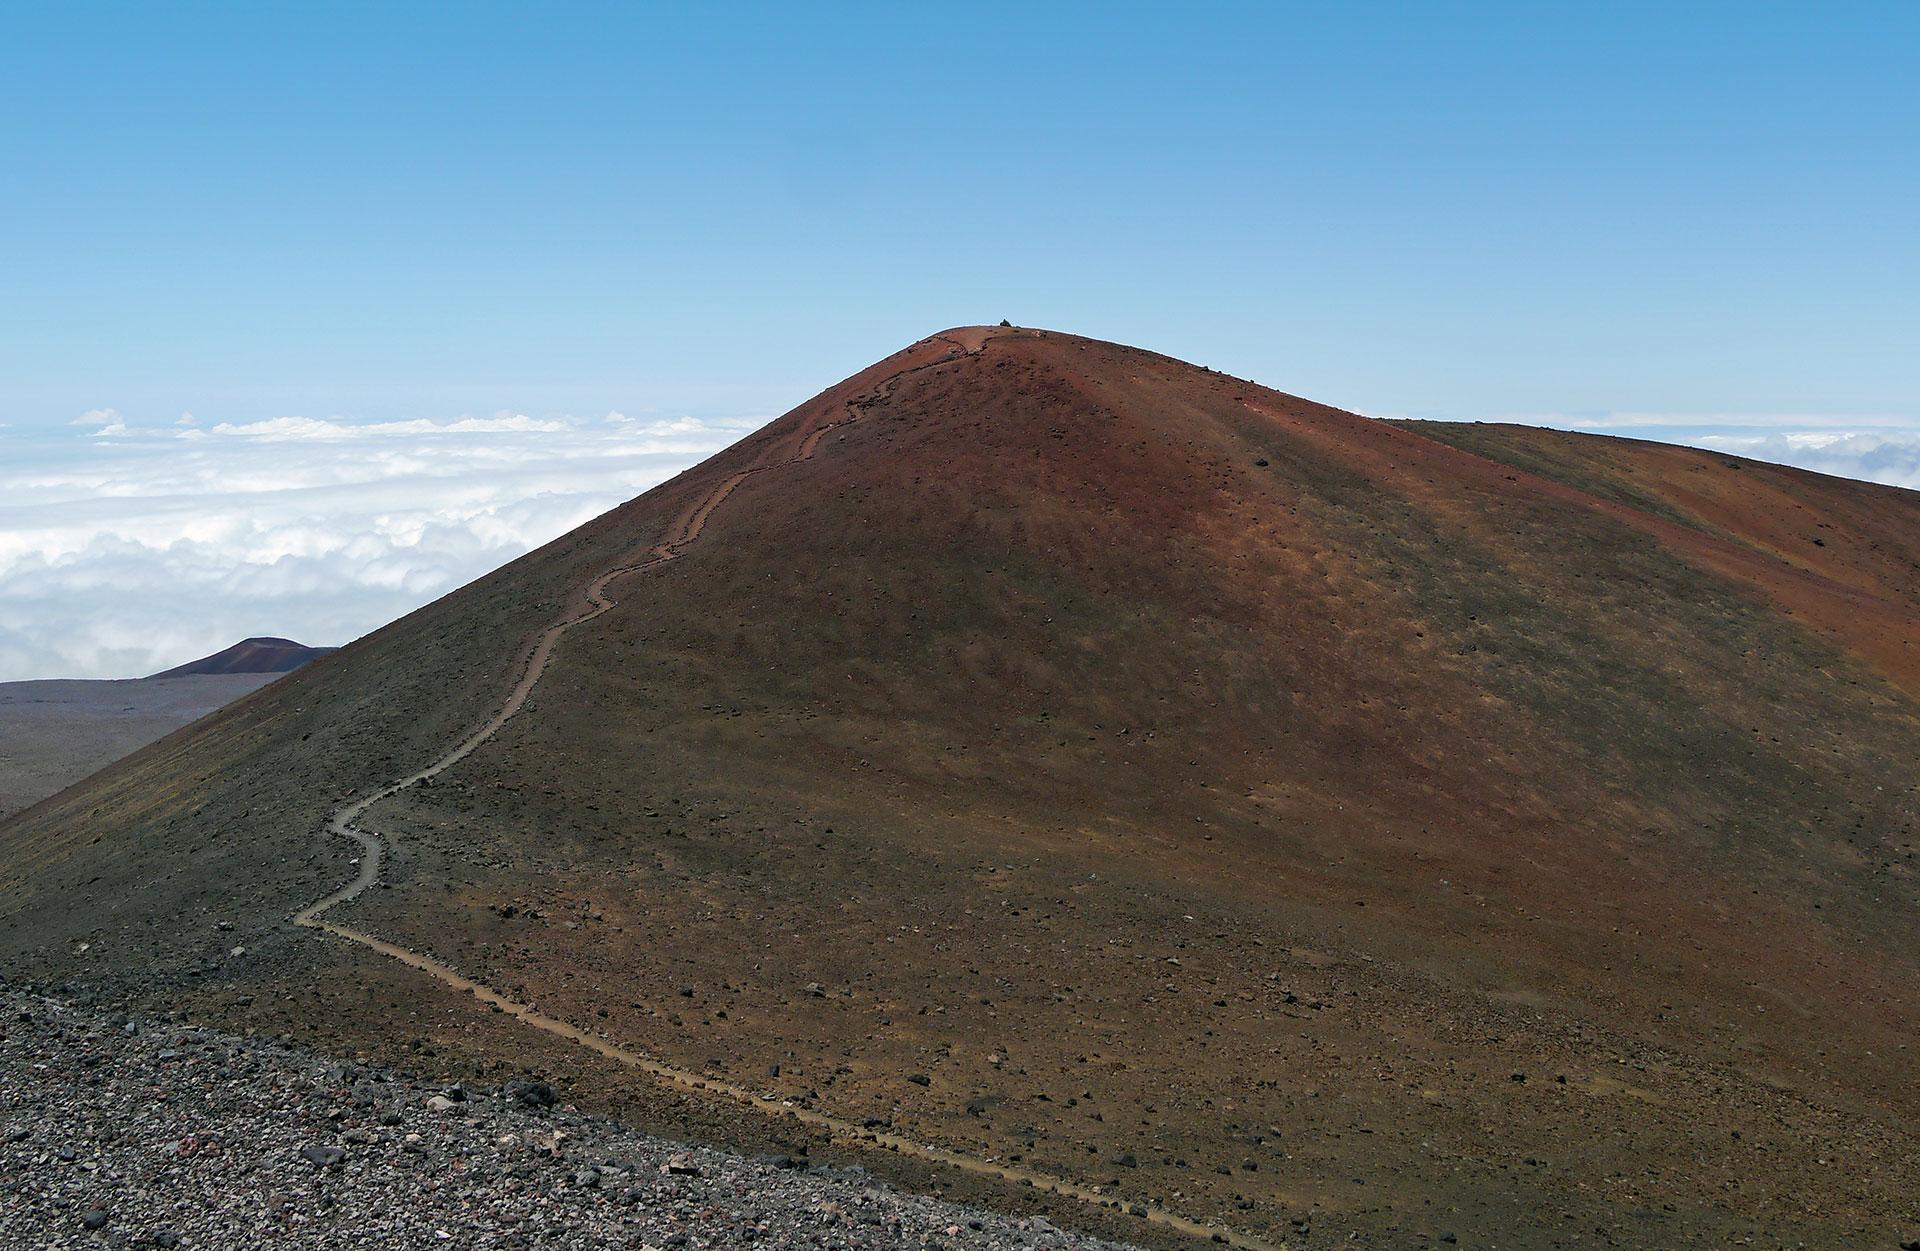 Mauna Kea Trail to the summit of Mauna Kea, Big Island, Hawaii. The cinder cone that is the highest point (13,796 feet) is called Pu'u Wekiu.